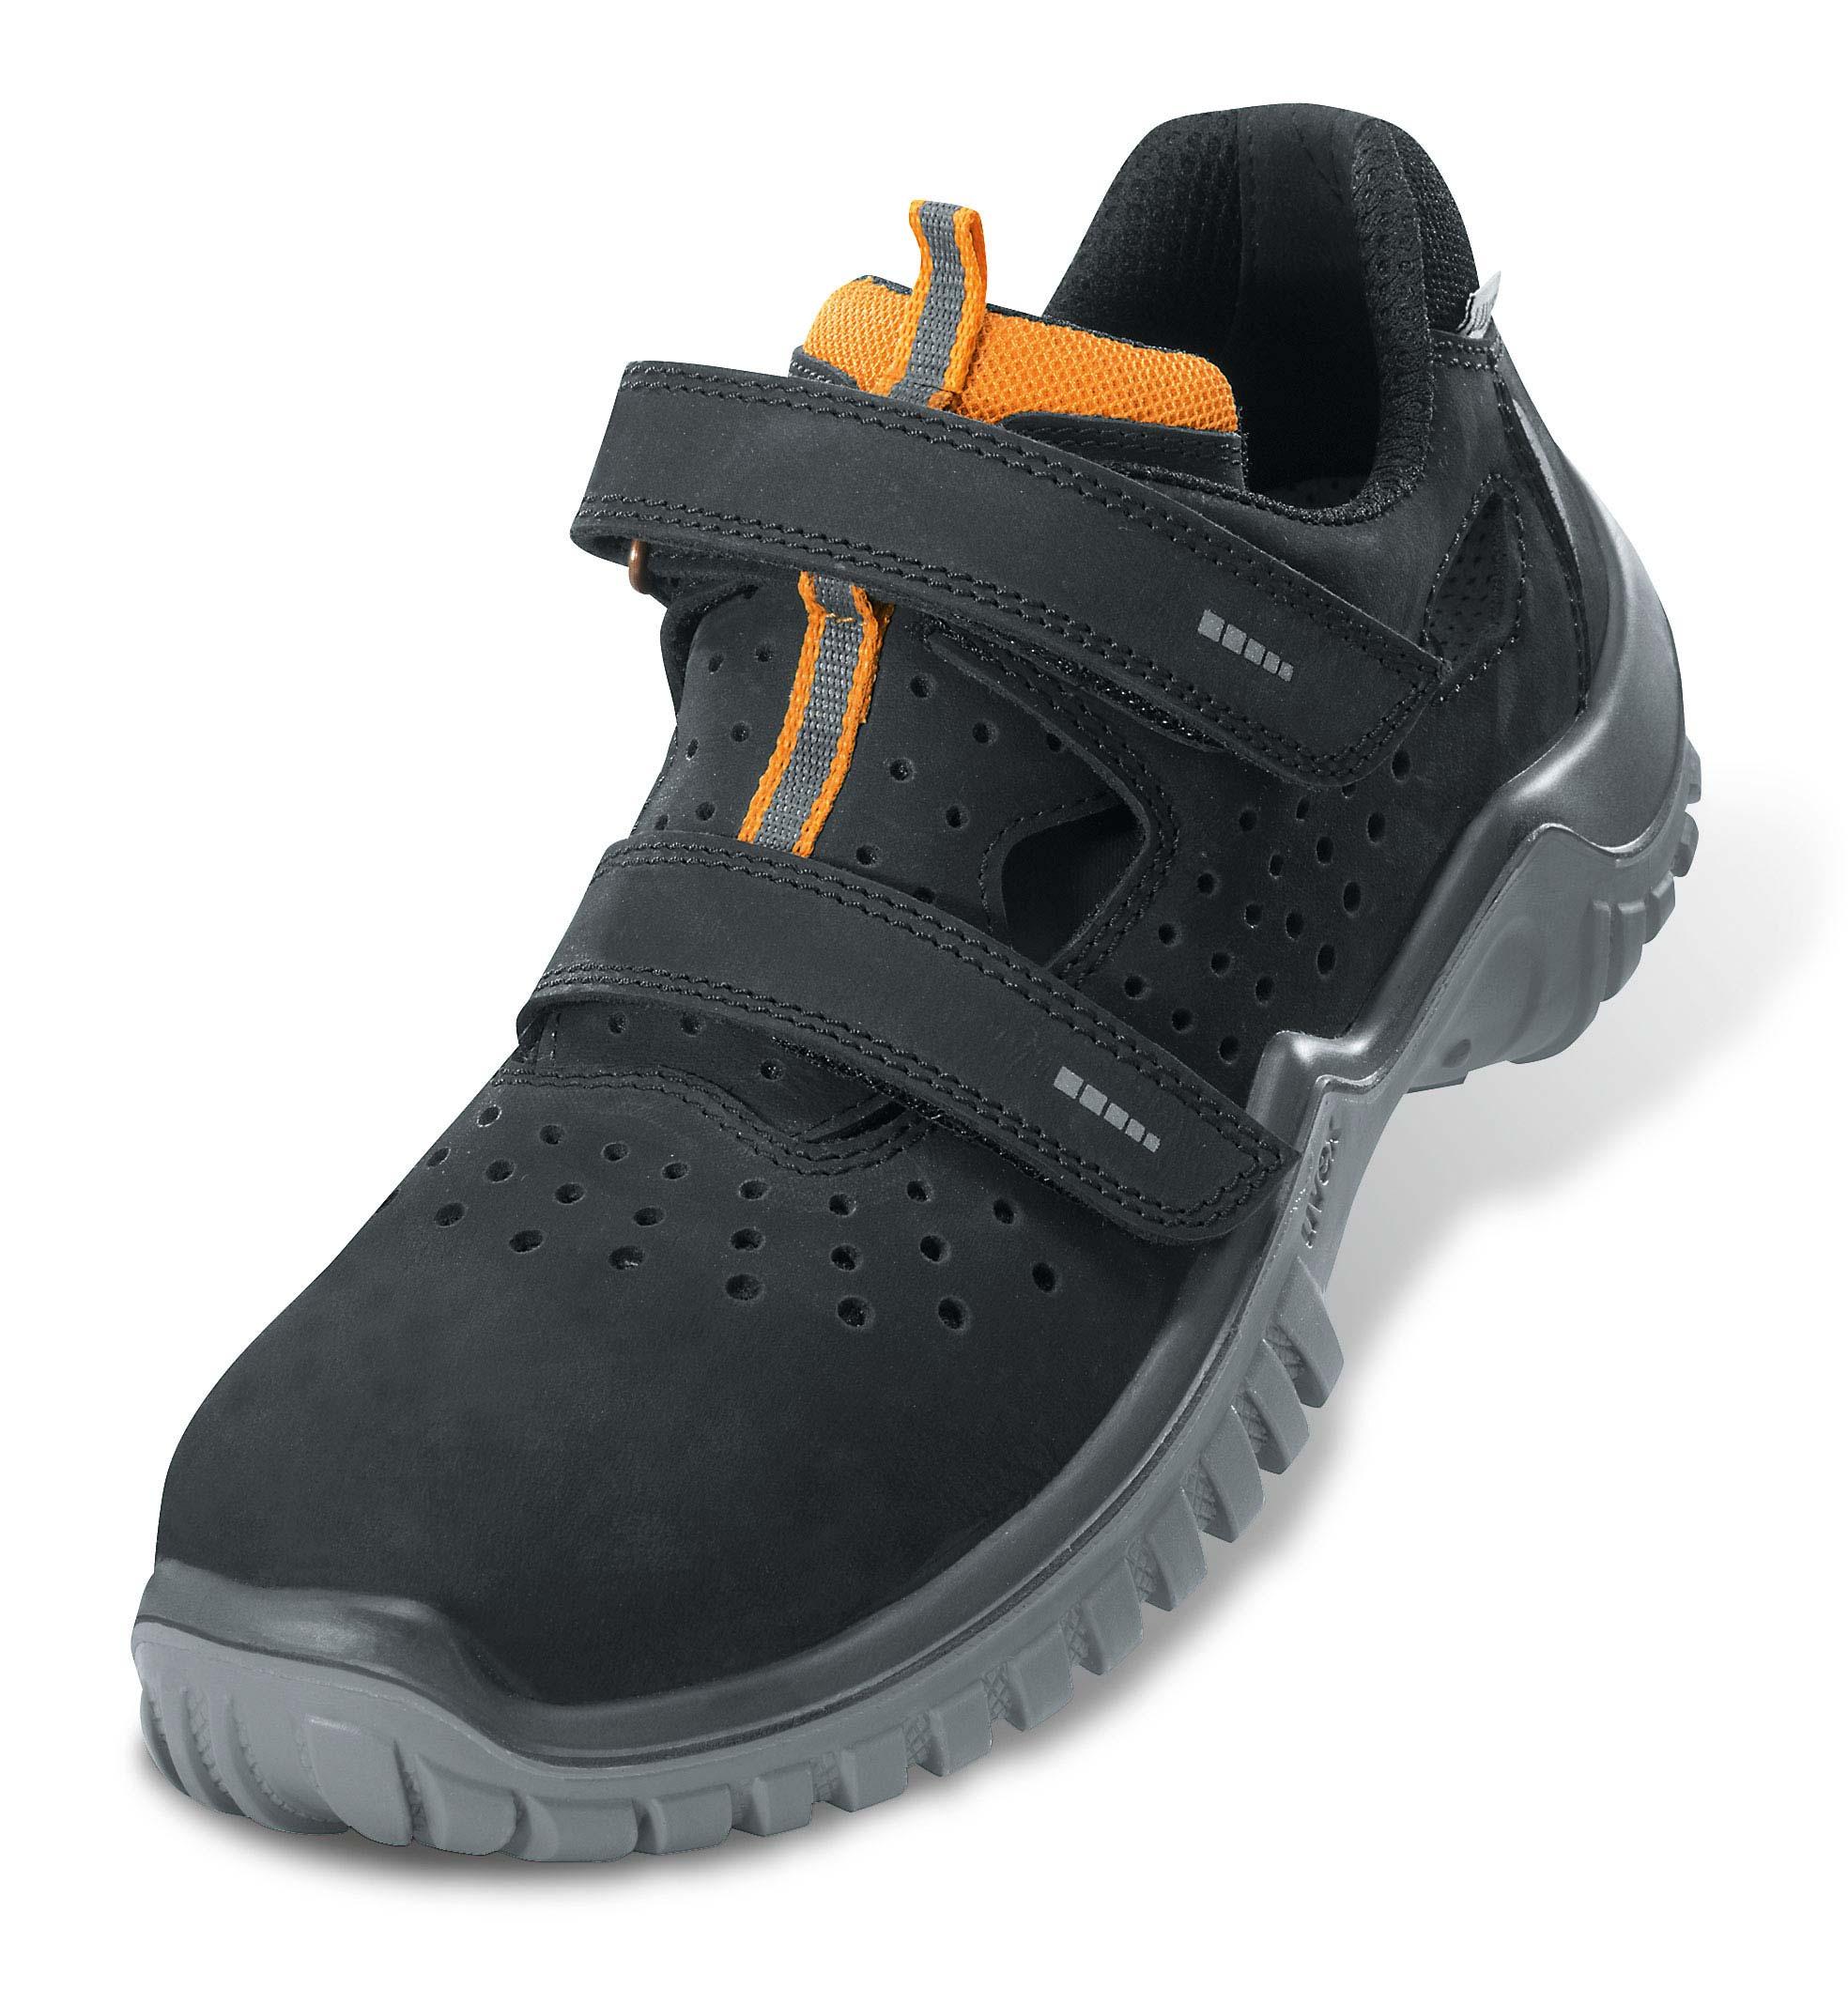 sandale uvex motion sport s1 src sicherheitsschuhe uvex safety. Black Bedroom Furniture Sets. Home Design Ideas